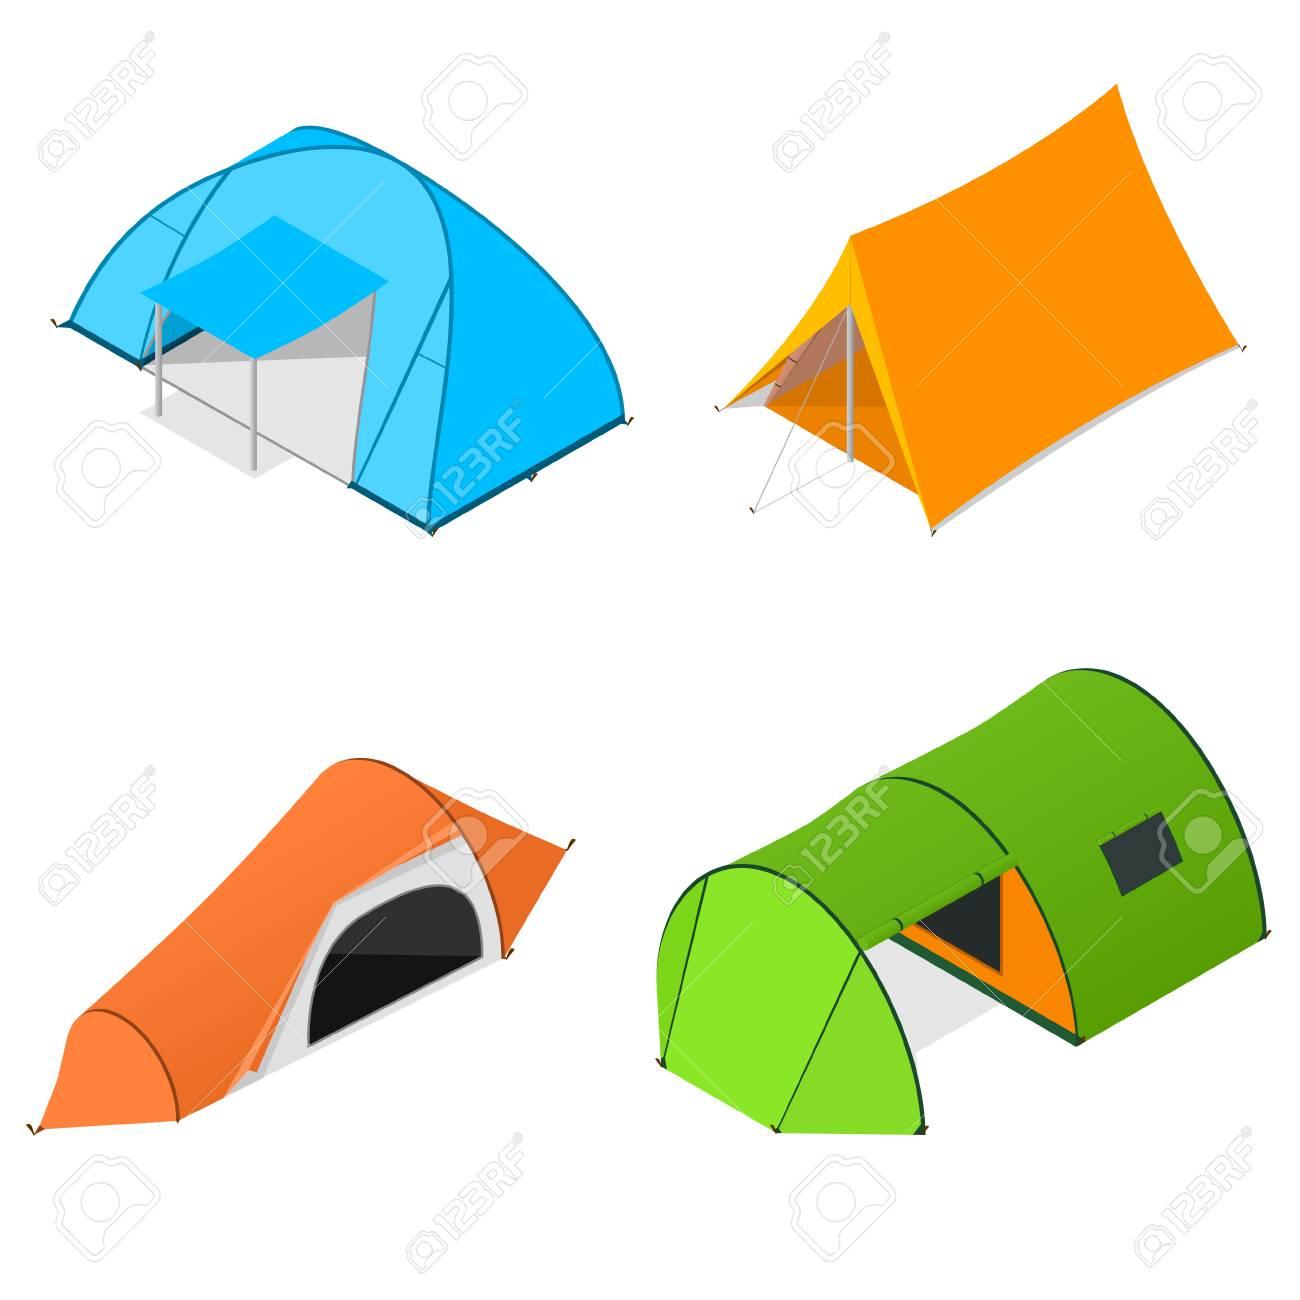 Color C&ing Tent Set. Tourist C&. Vector illustration Stock Vector - 64154772  sc 1 st  123RF Stock Photos & Color Camping Tent Set. Tourist Camp. Vector Illustration Royalty ...